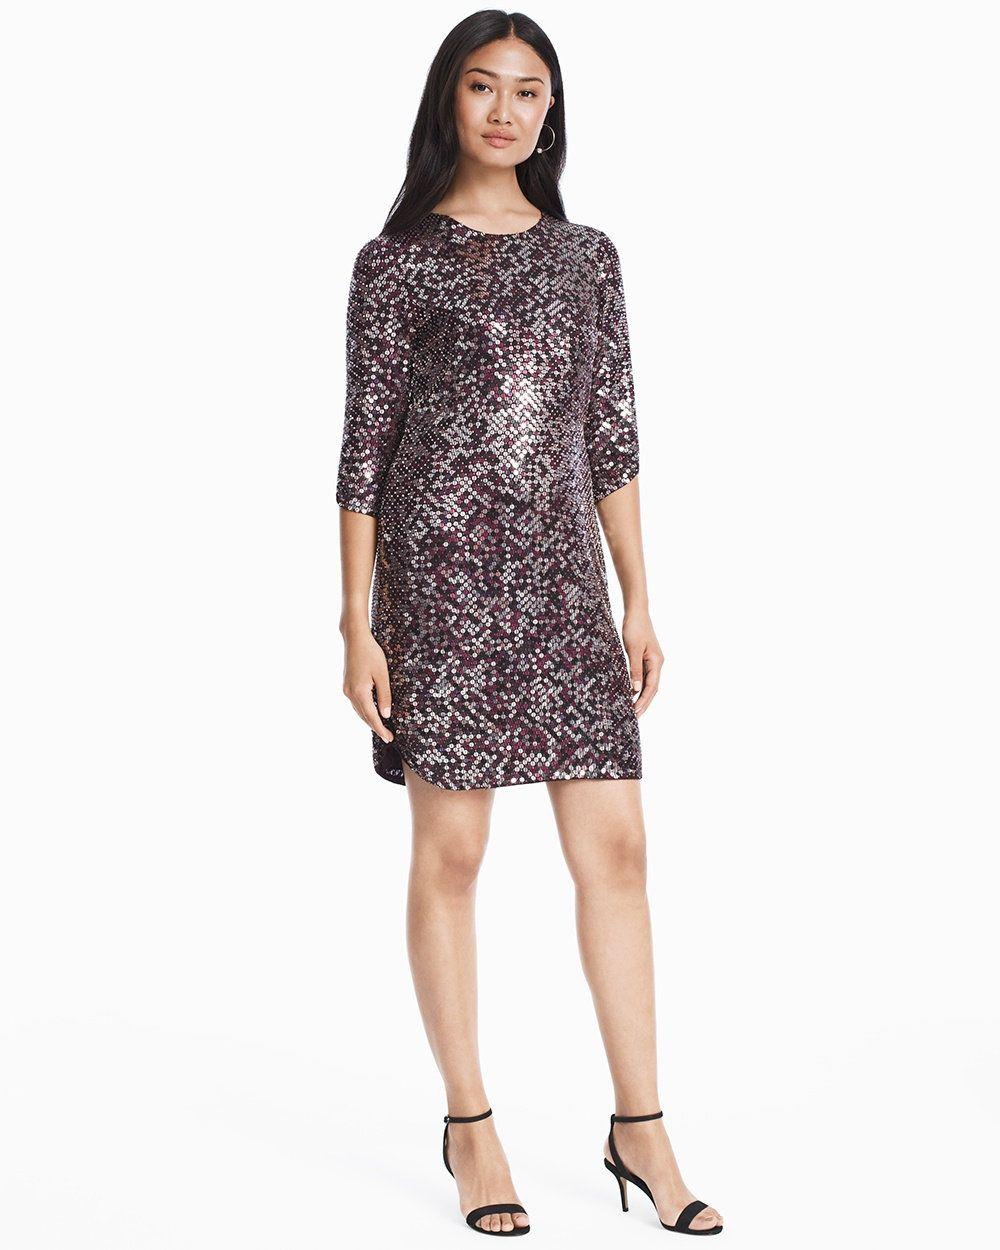 c1746c13ae54 Petra 3/4-Sleeve Sequin Shift Dress WHBM | Designer Dresses | Dress ...